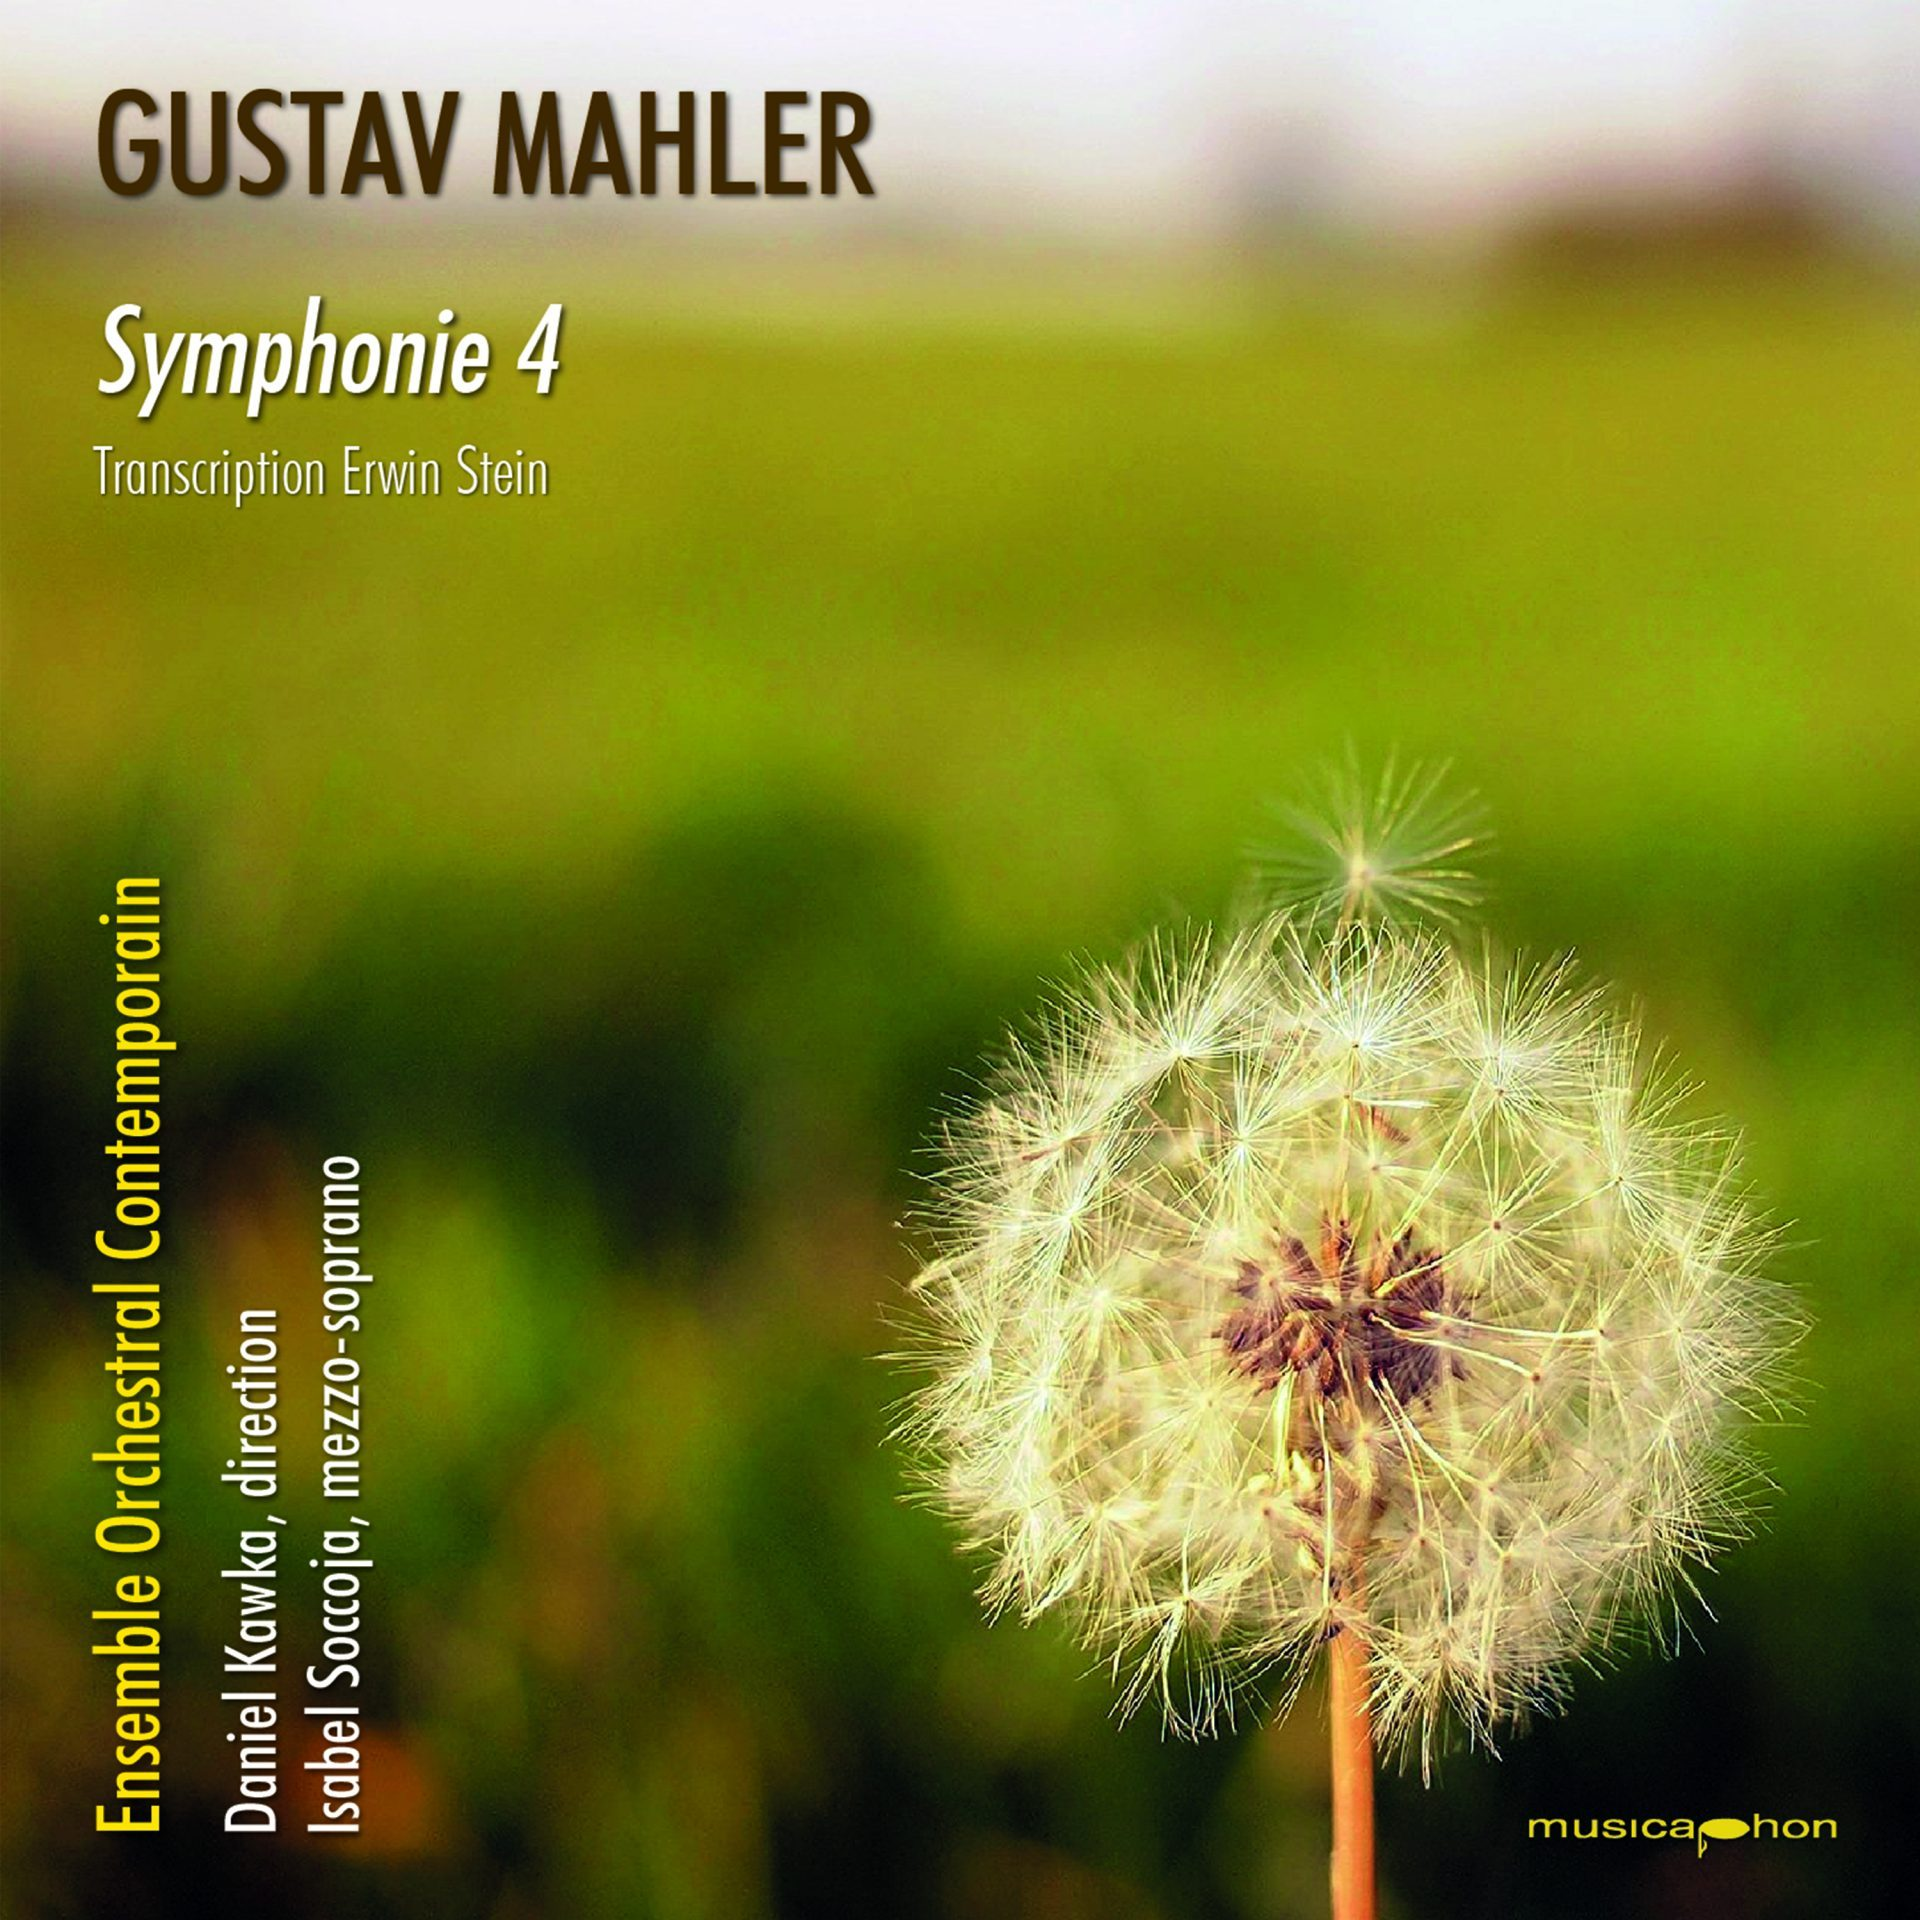 Gustav Mahler - Symphonie n°4